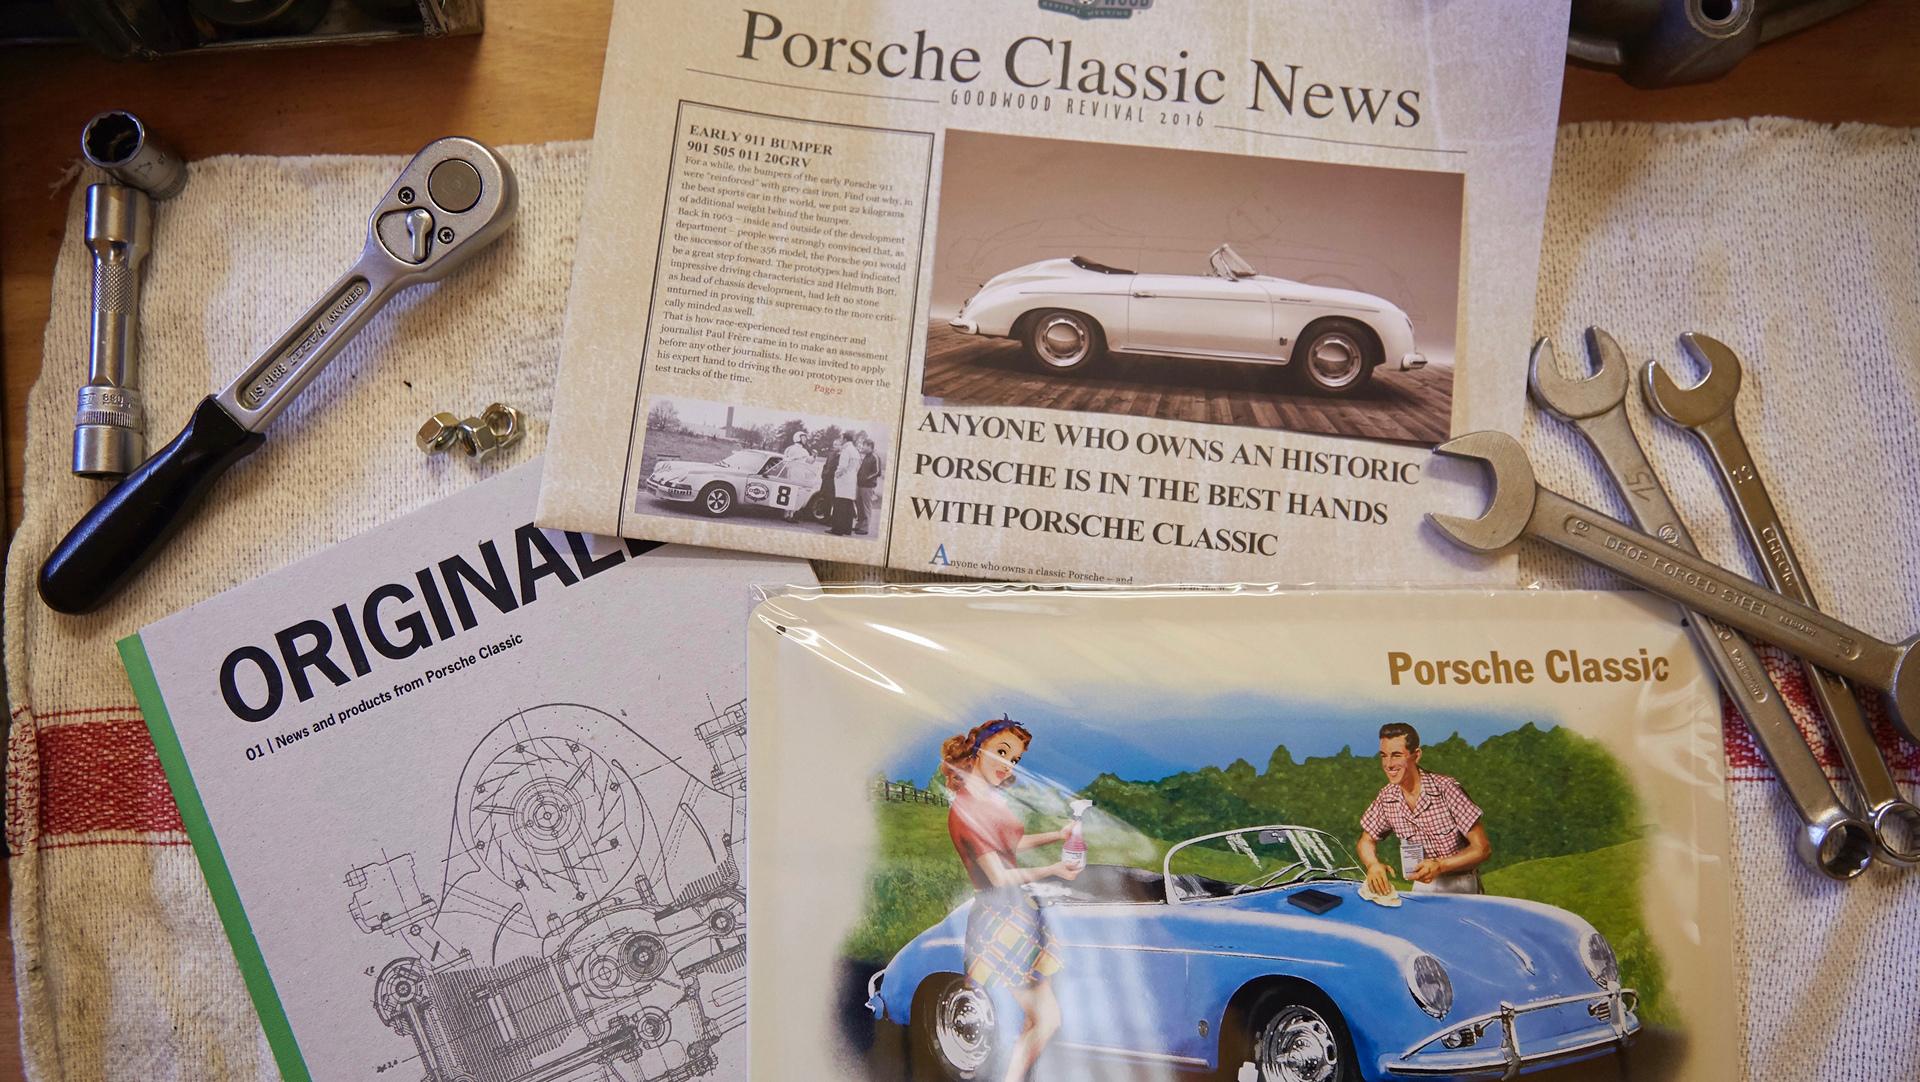 Goodwood Revival © Dr. Ing. h.c. F. Porsche AG